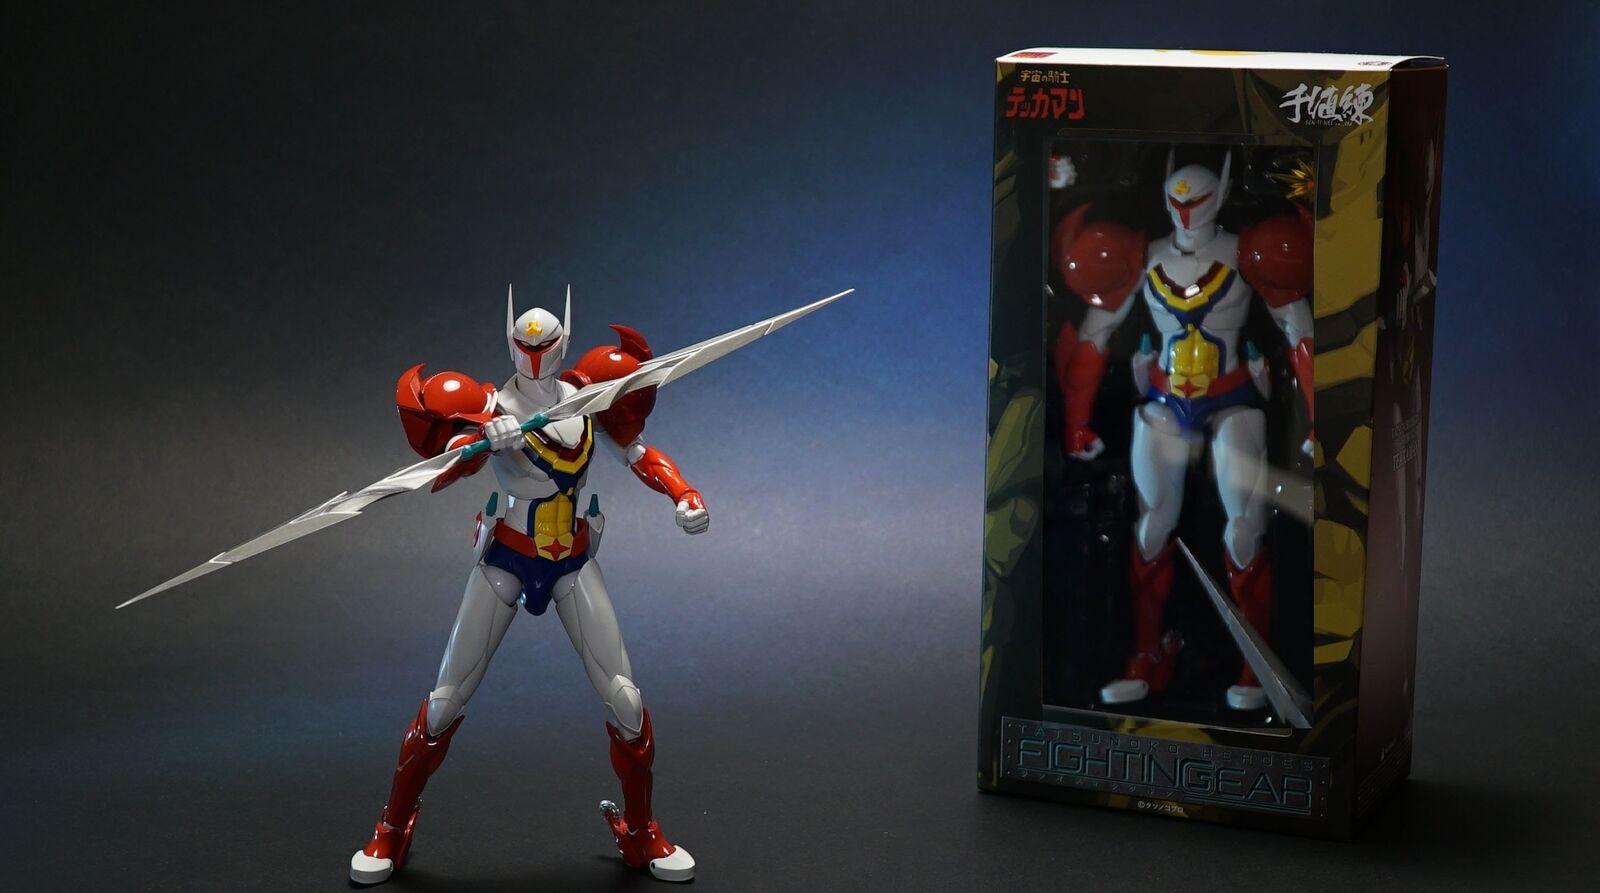 Space Knight Tekkaman Tatsunoko Fightingear Sentinel Die Cast Action Figure 18cm